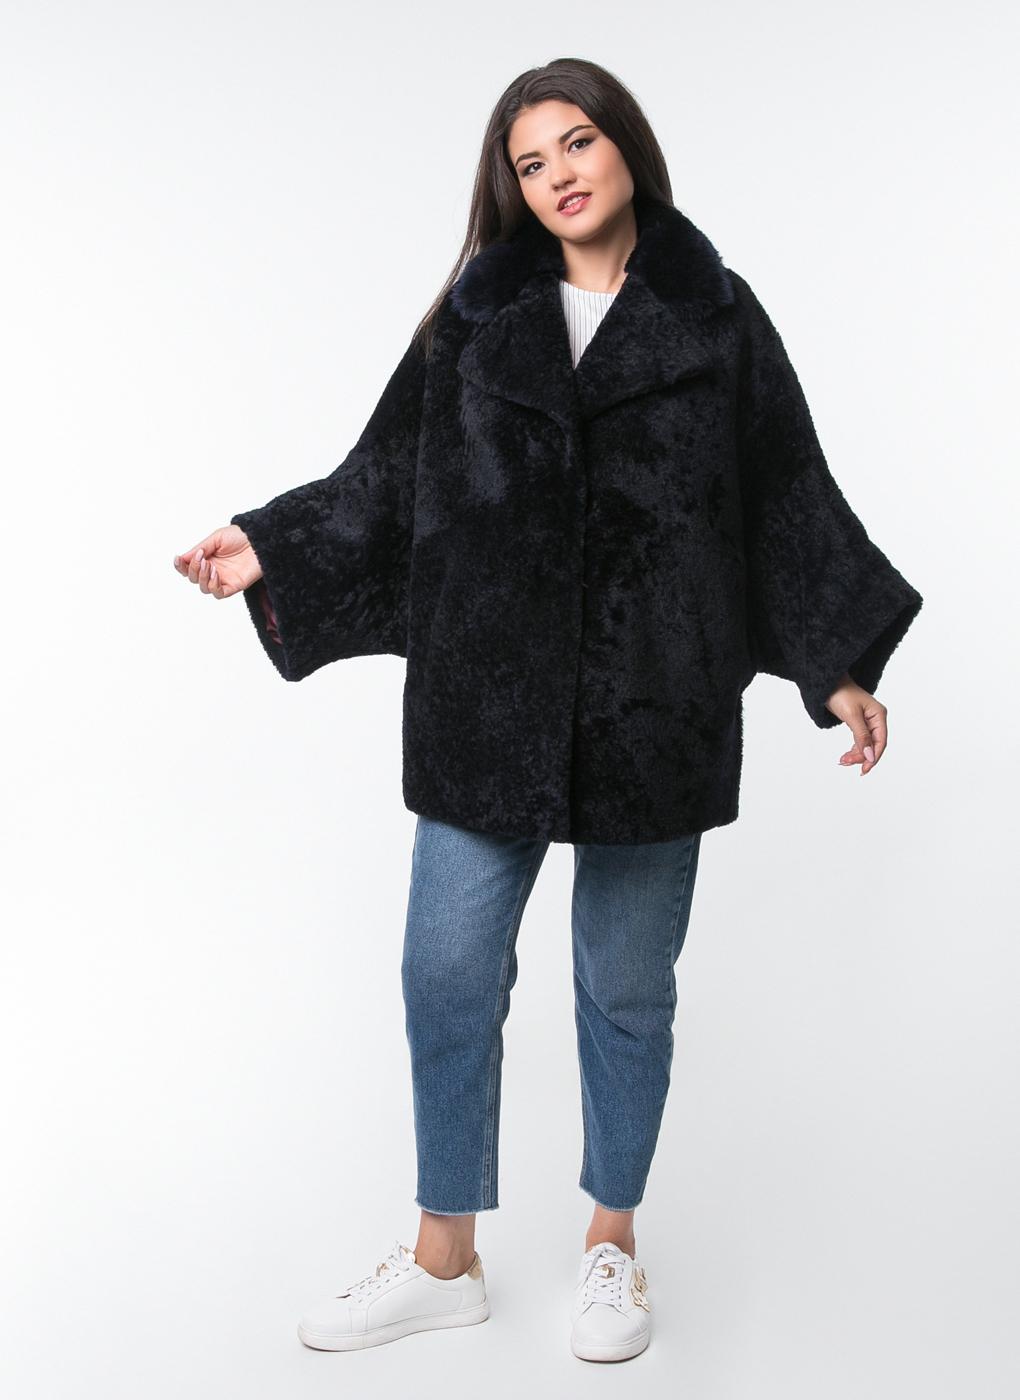 Куртка из овчины трапеция 02, Perre